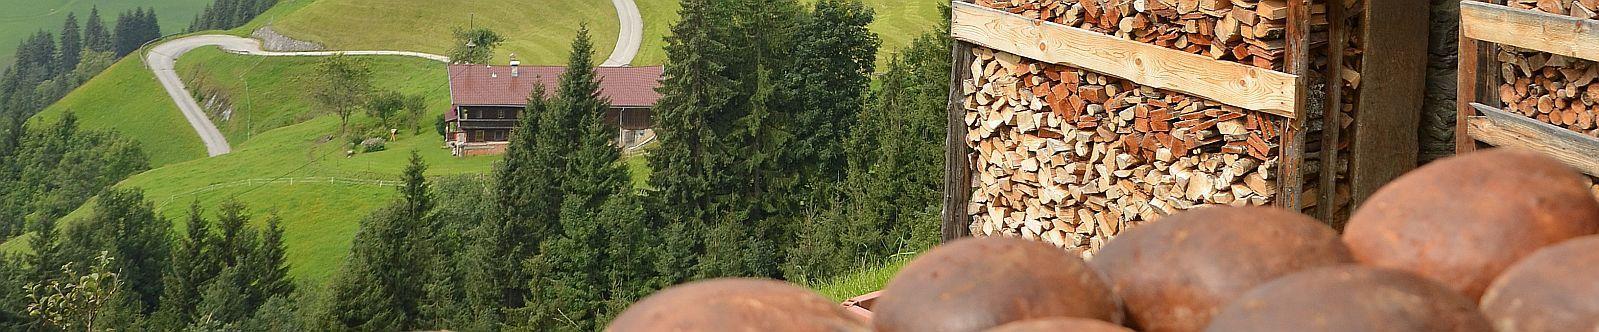 Header7 © Susanne Seisl - LFI Tirol